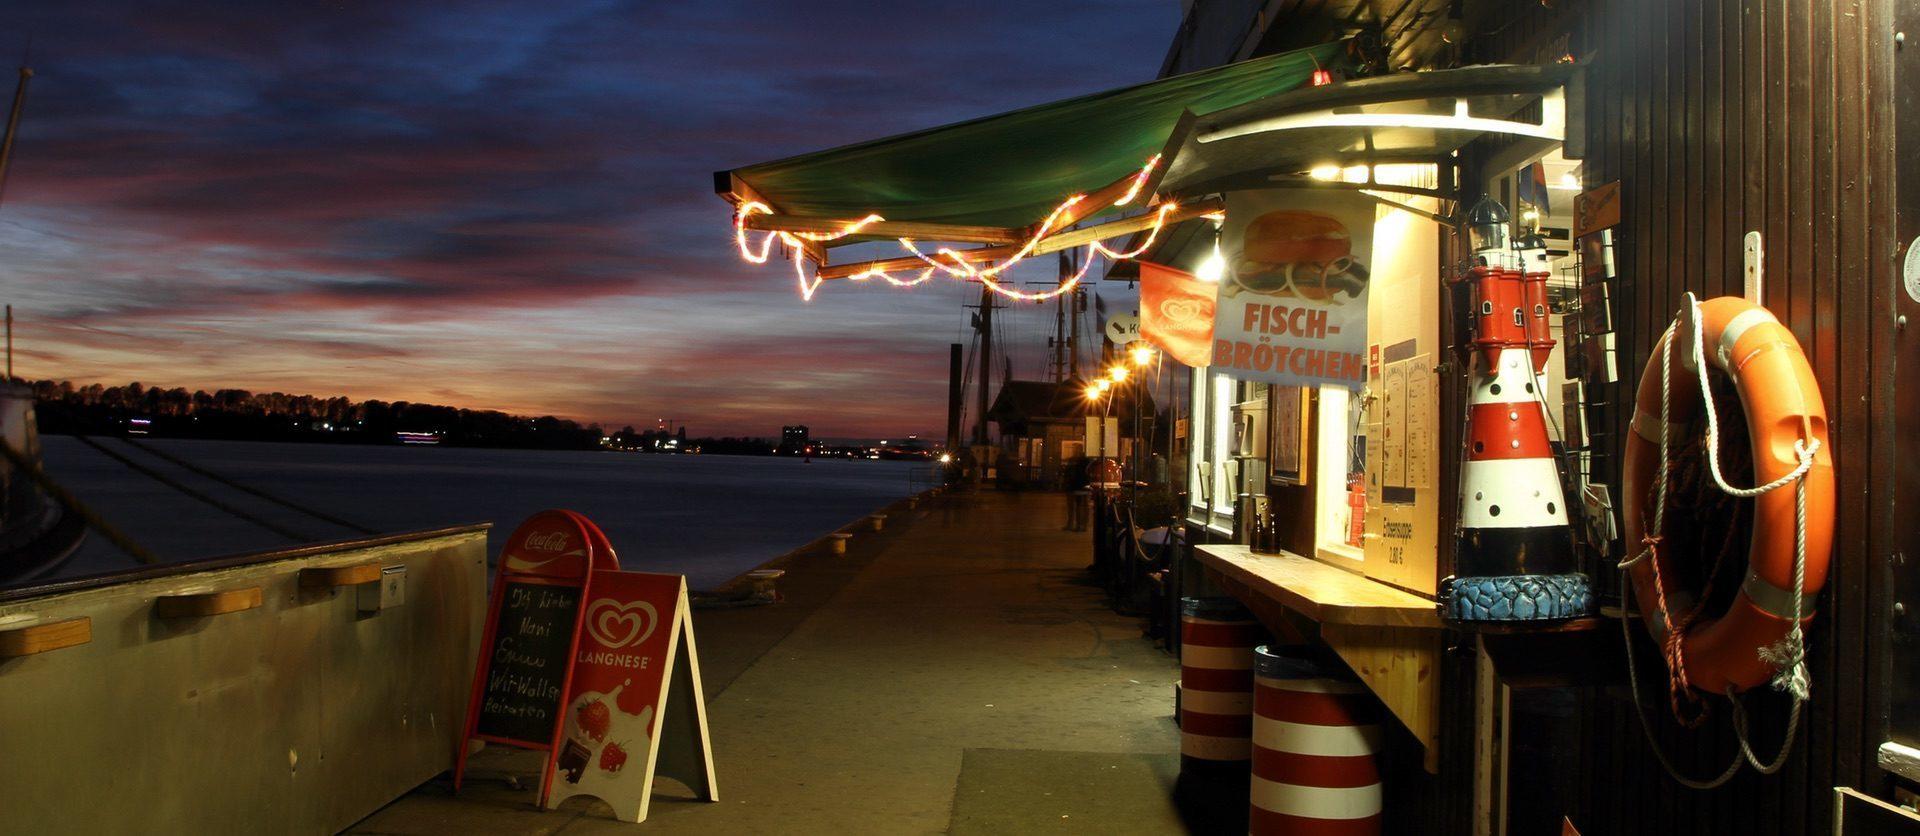 Imbissbude am Hamburger Hafen